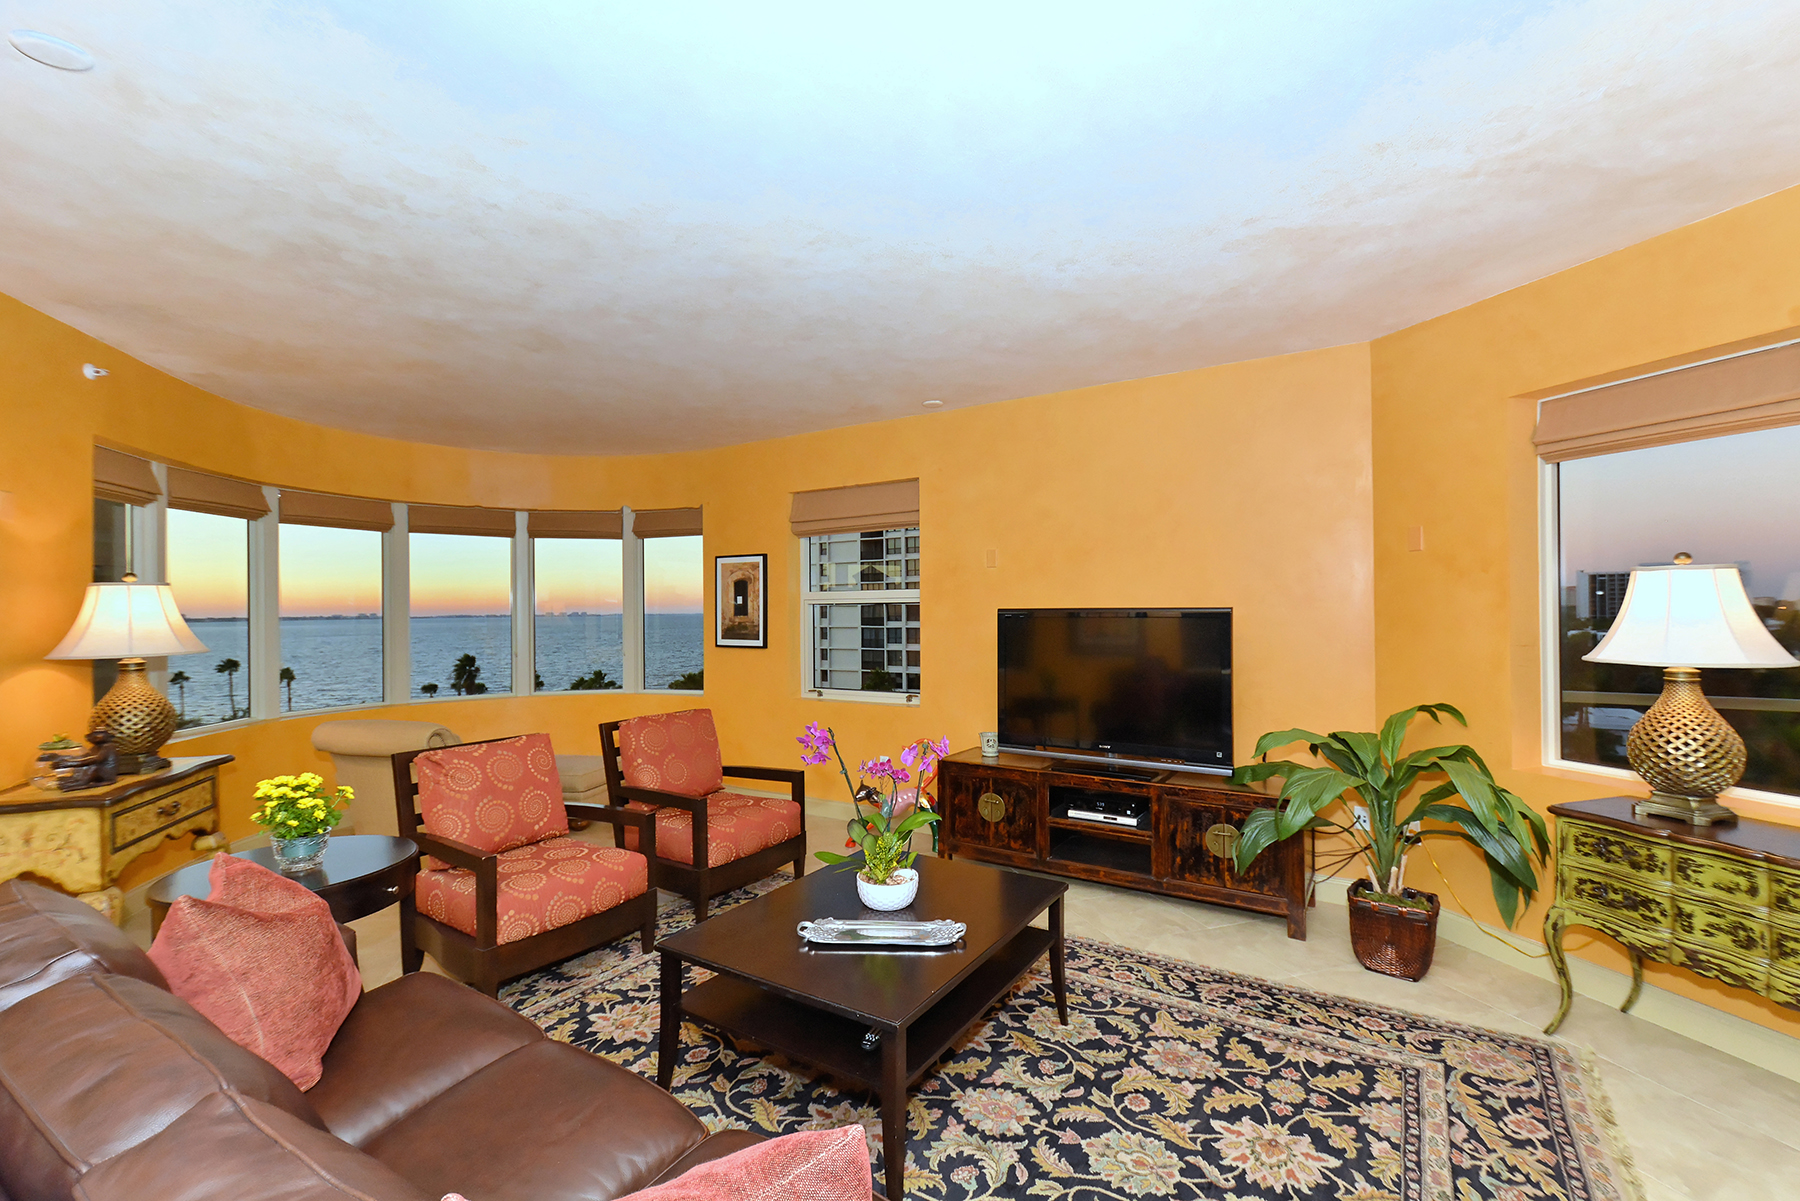 Condominium for Sale at GOLDEN GATE POINT 128 Golden Gate Pt 601B, Sarasota, Florida 34236 United States